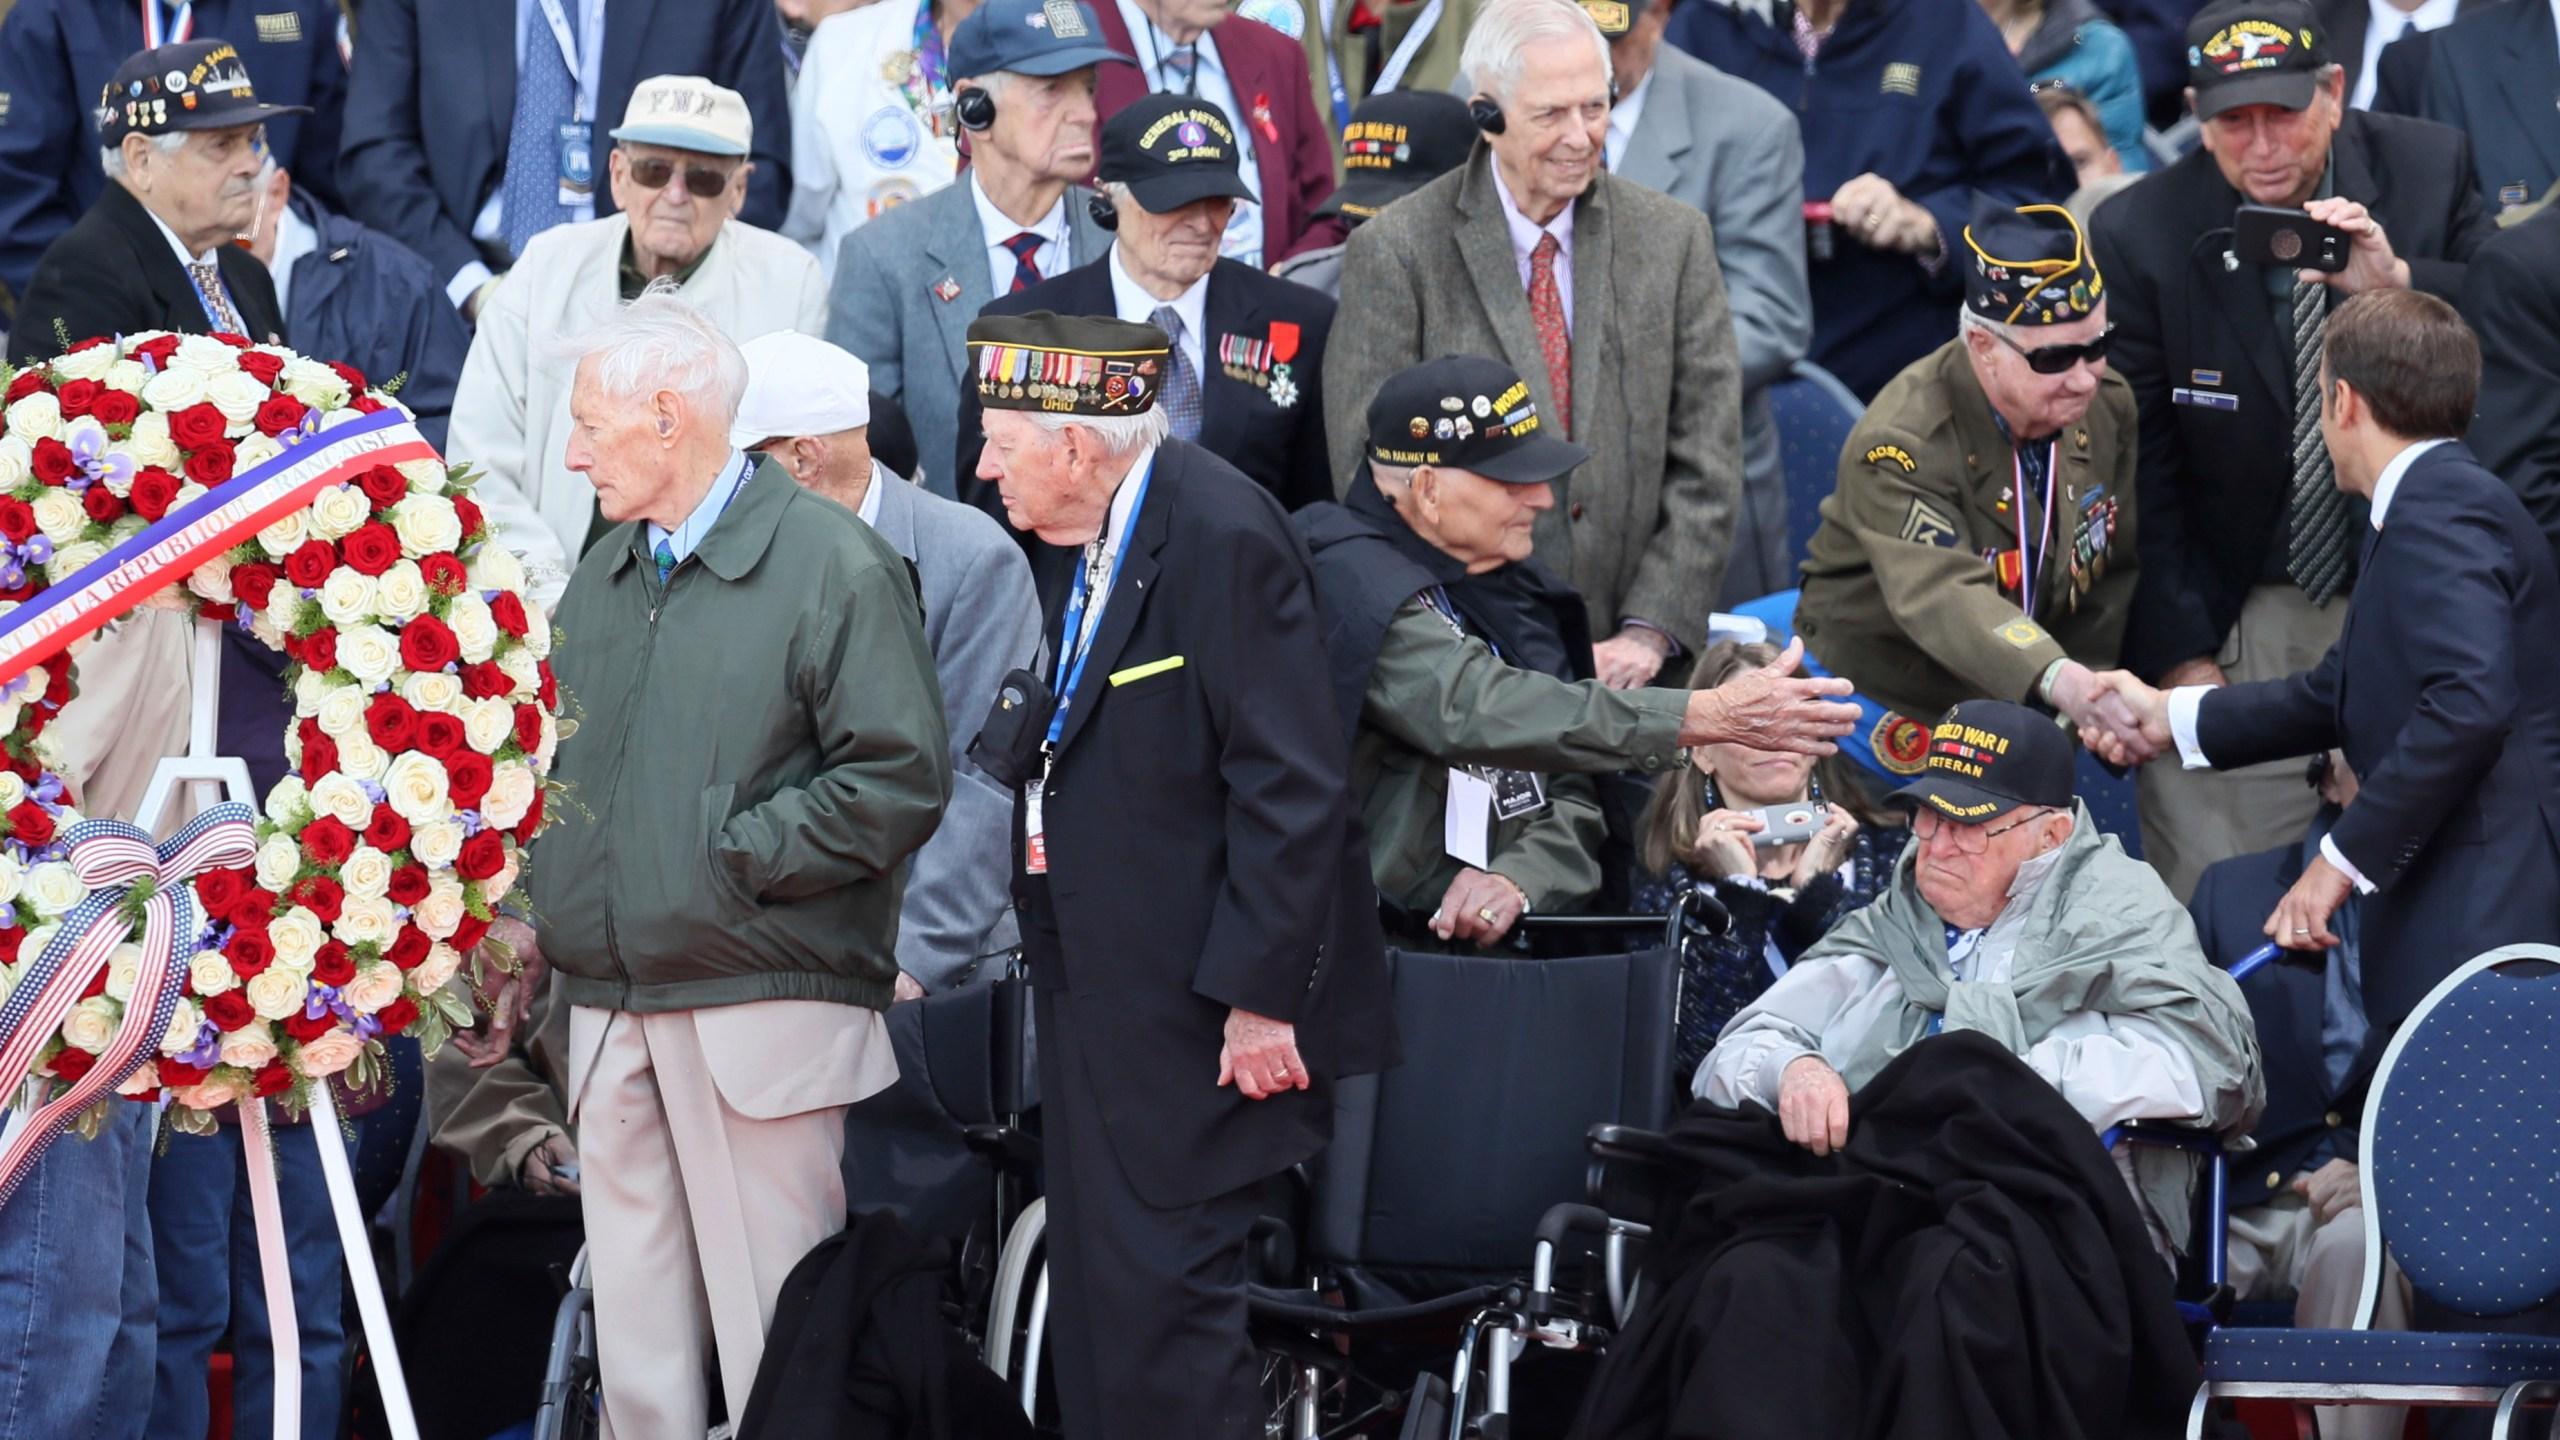 France_D-Day_Anniversary_20192-159532.jpg33714229